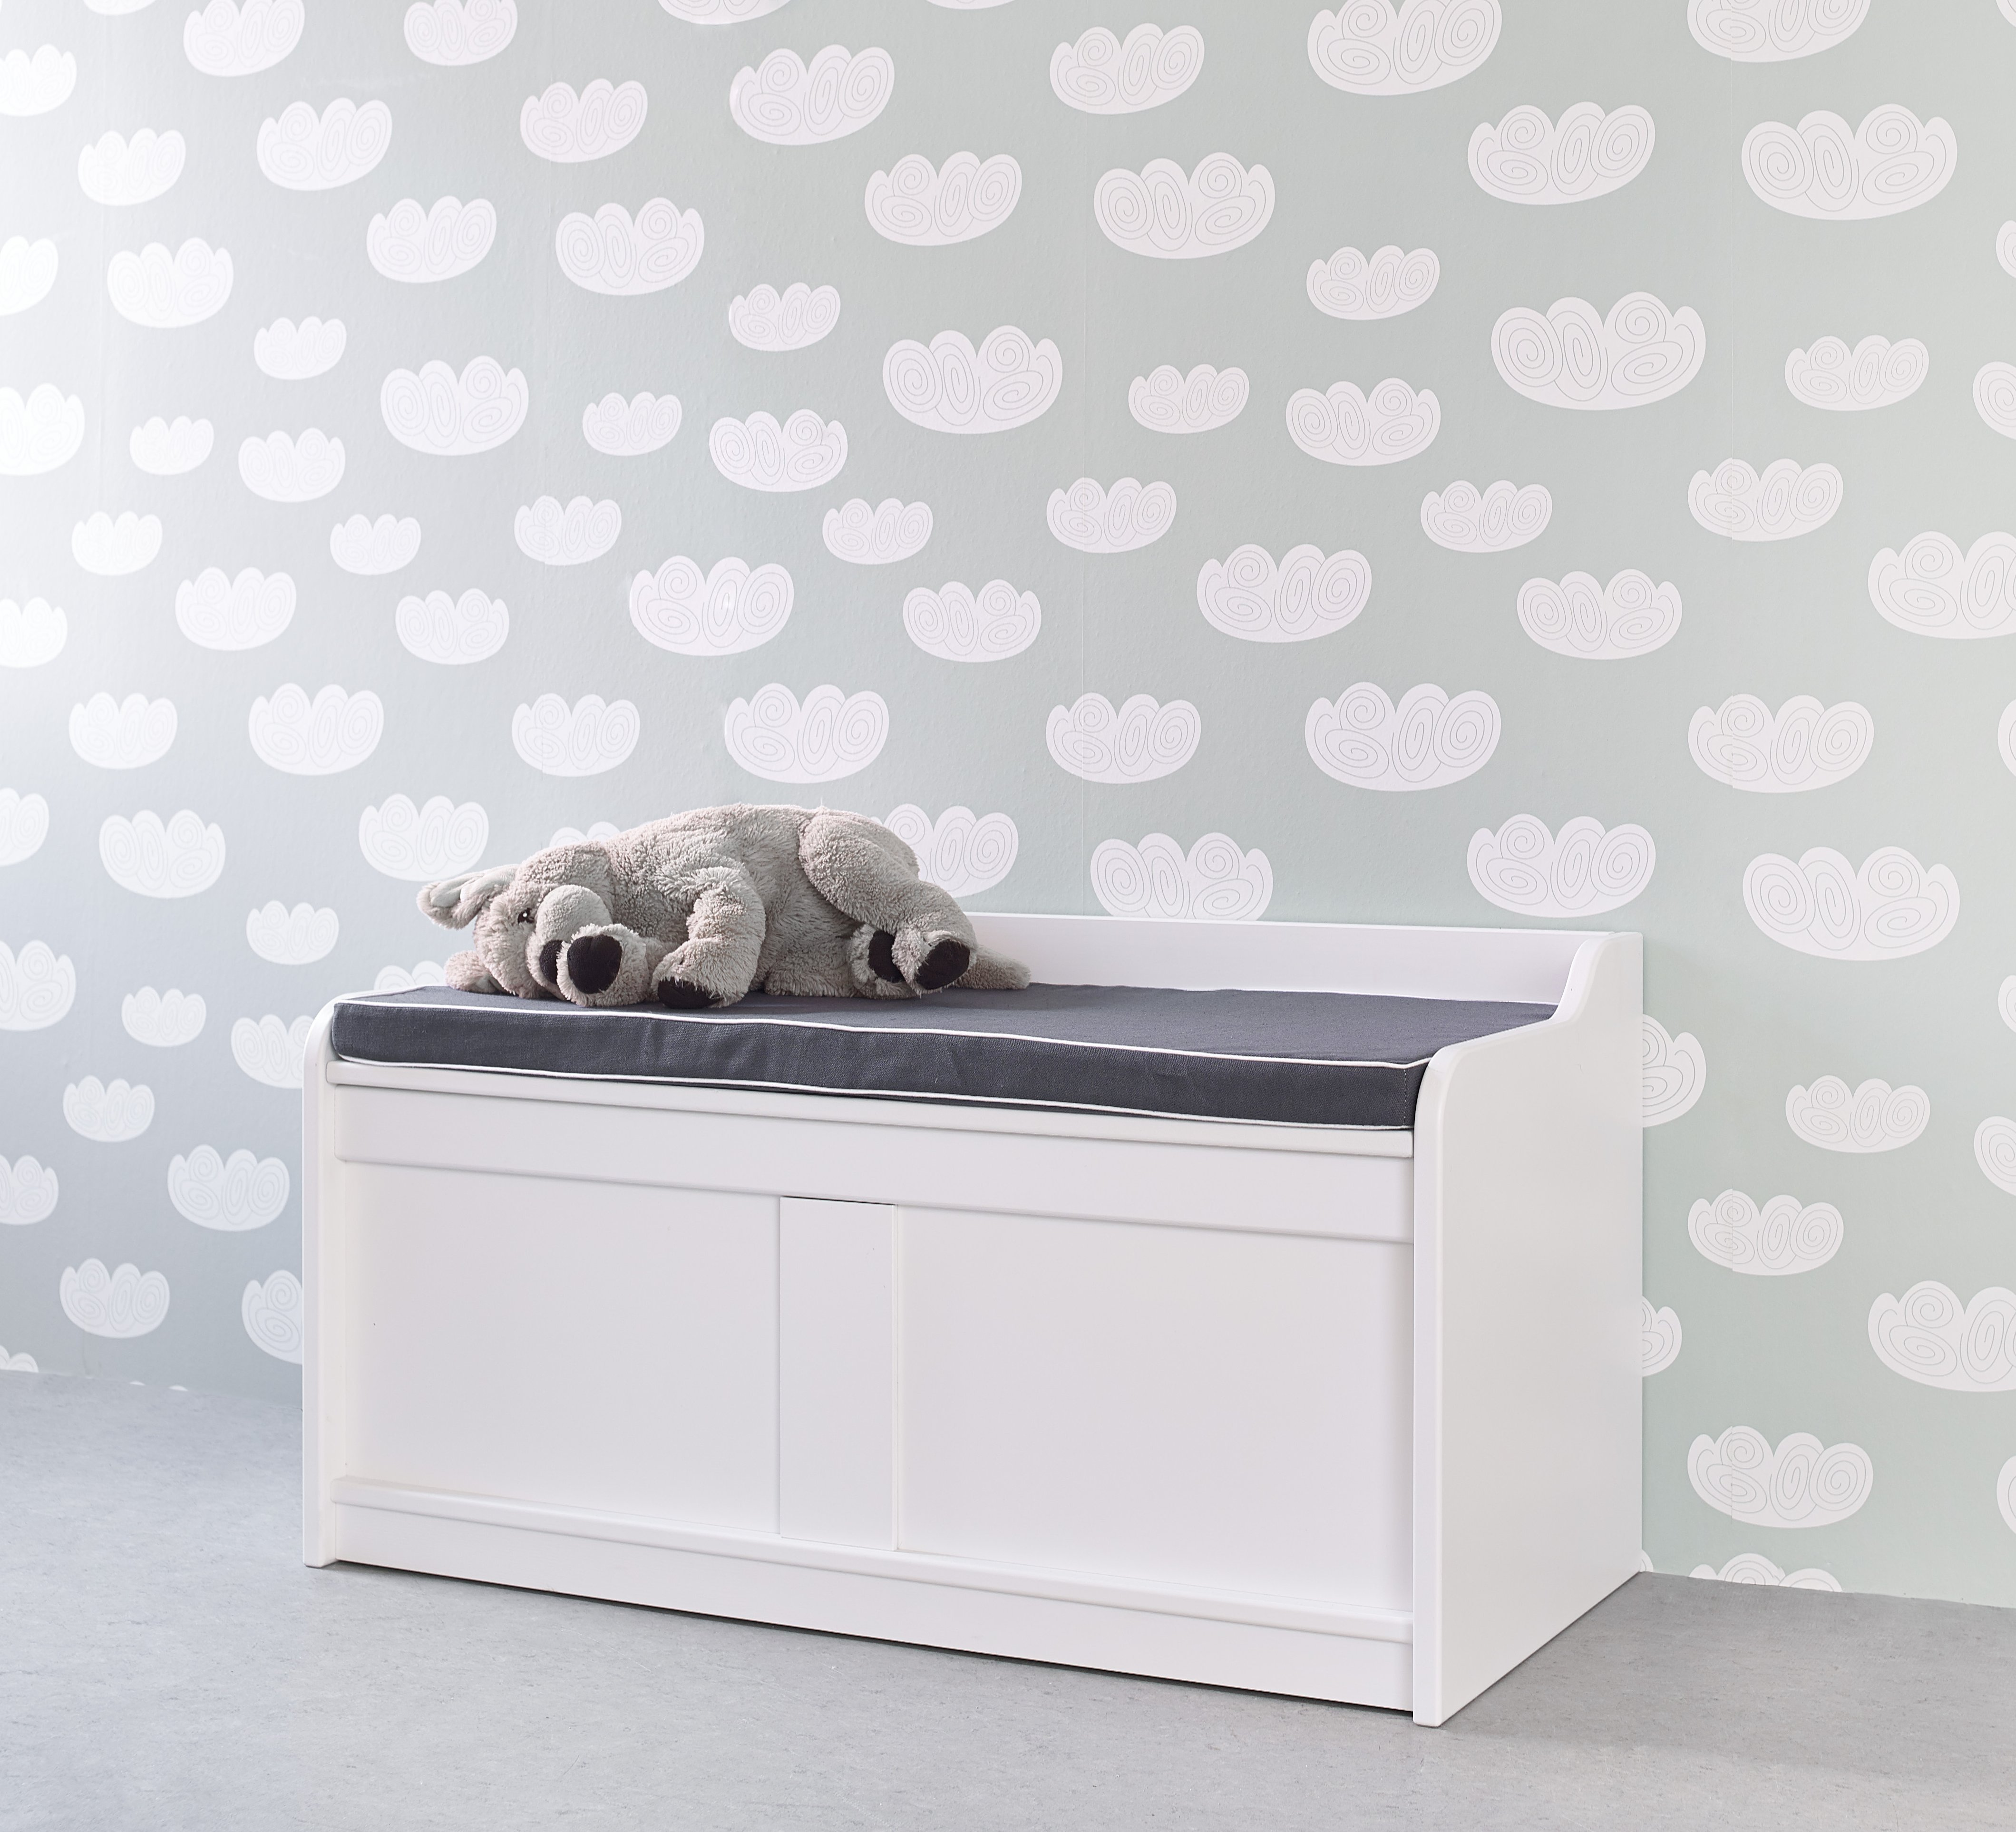 Products STORAGE All Storage Storage Bench With Grey Cush